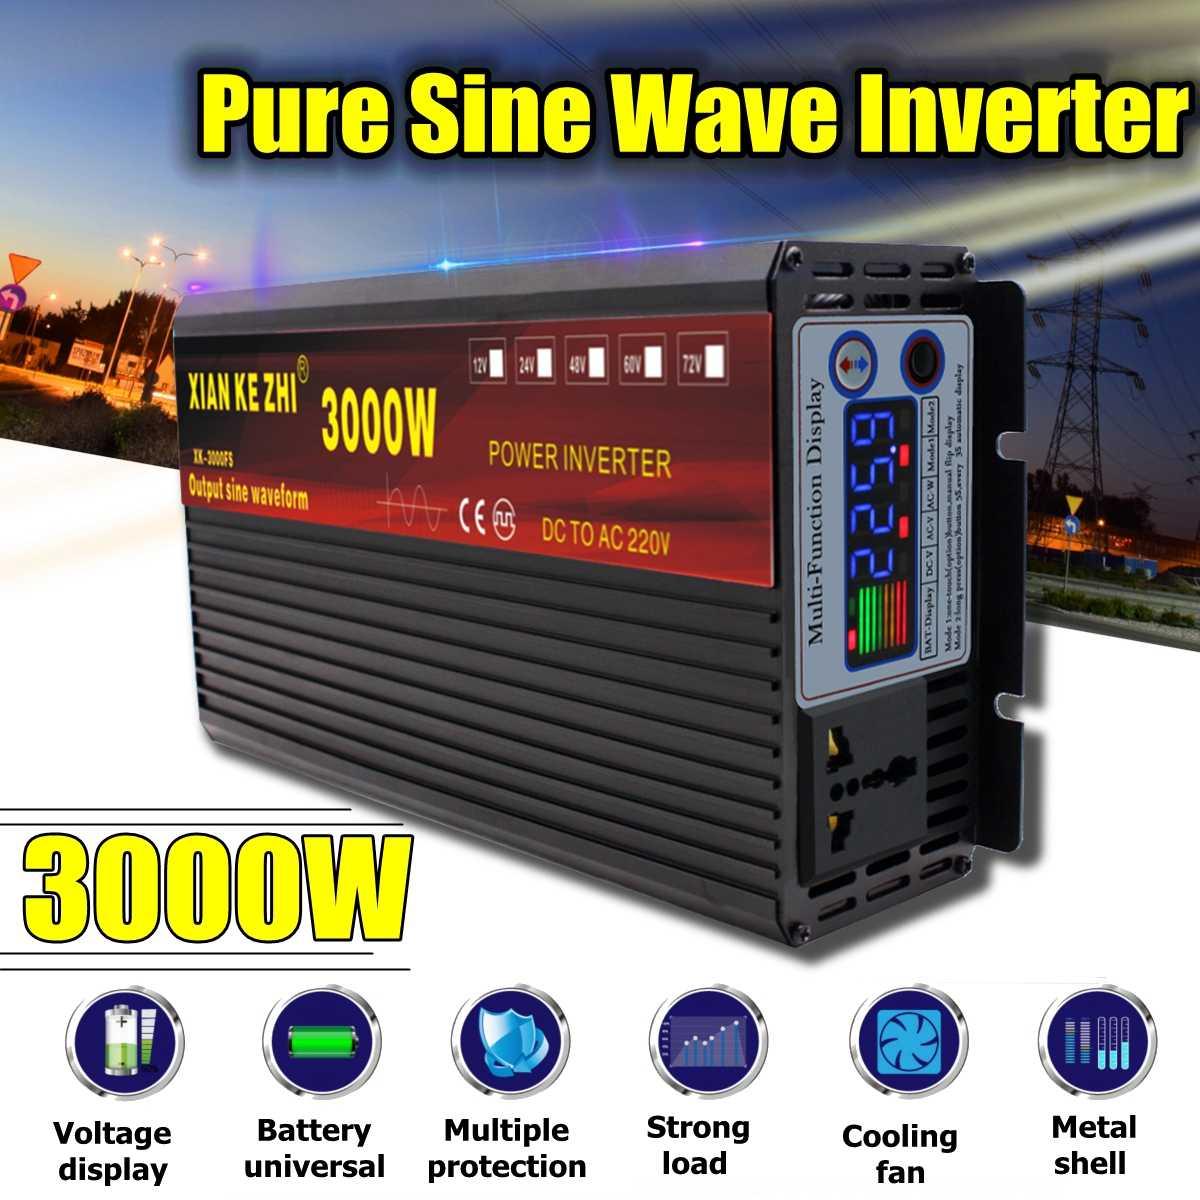 3000W Pure Sine Wave Inverter DC 12/24/48/60/72V TO AC 220V 50Hz Power Converter LCD Display